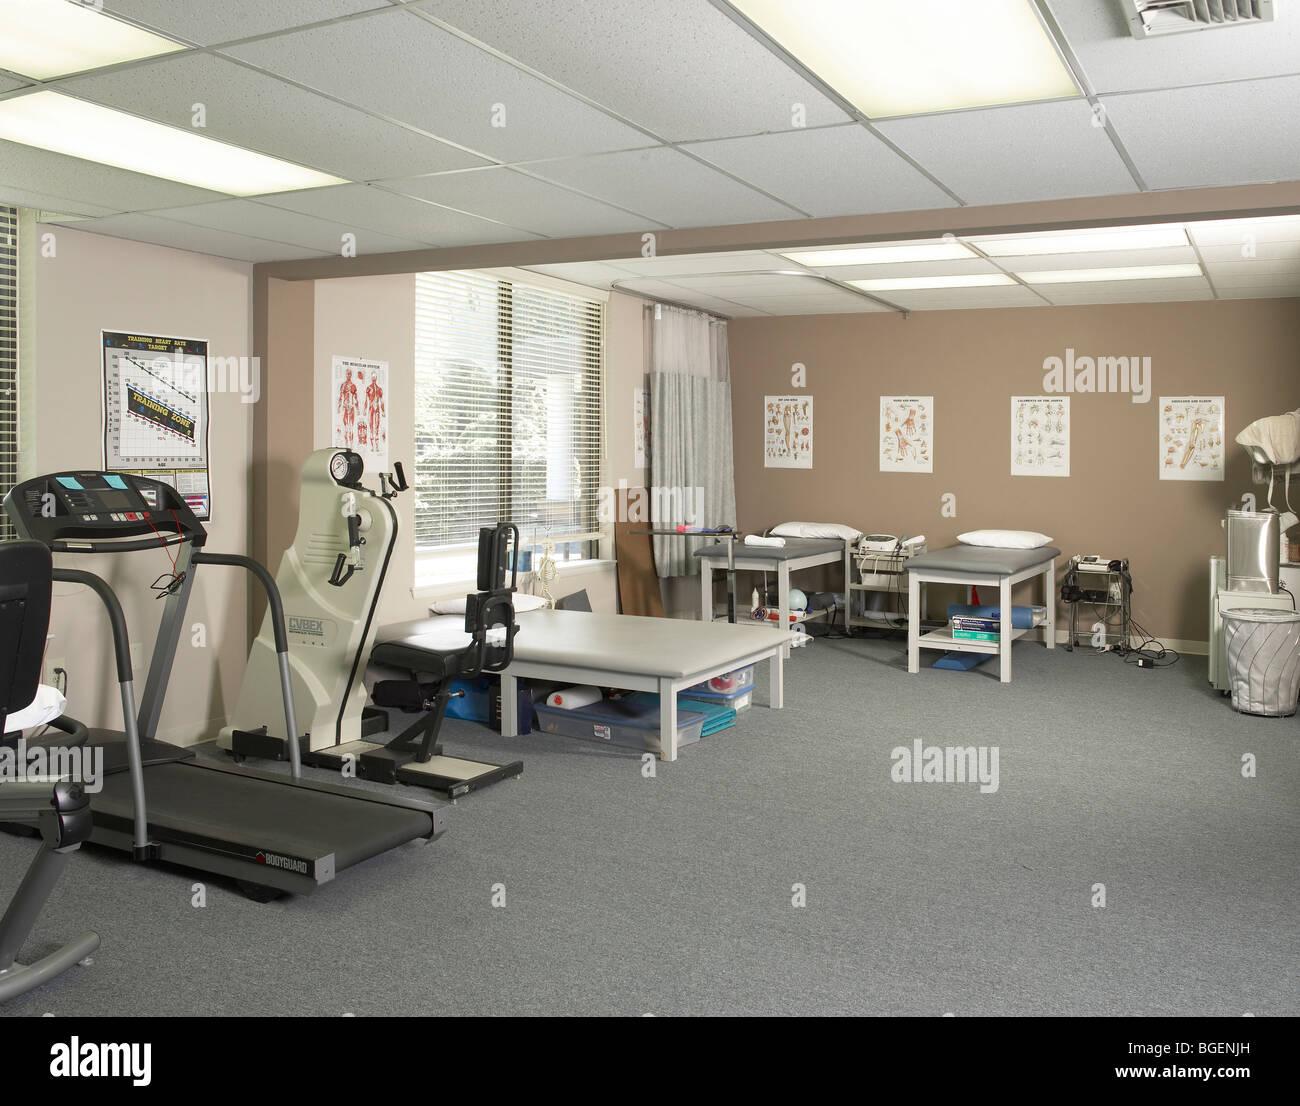 Physikalische Therapie-Fitnessraum, Philadelphia, USA Stockbild